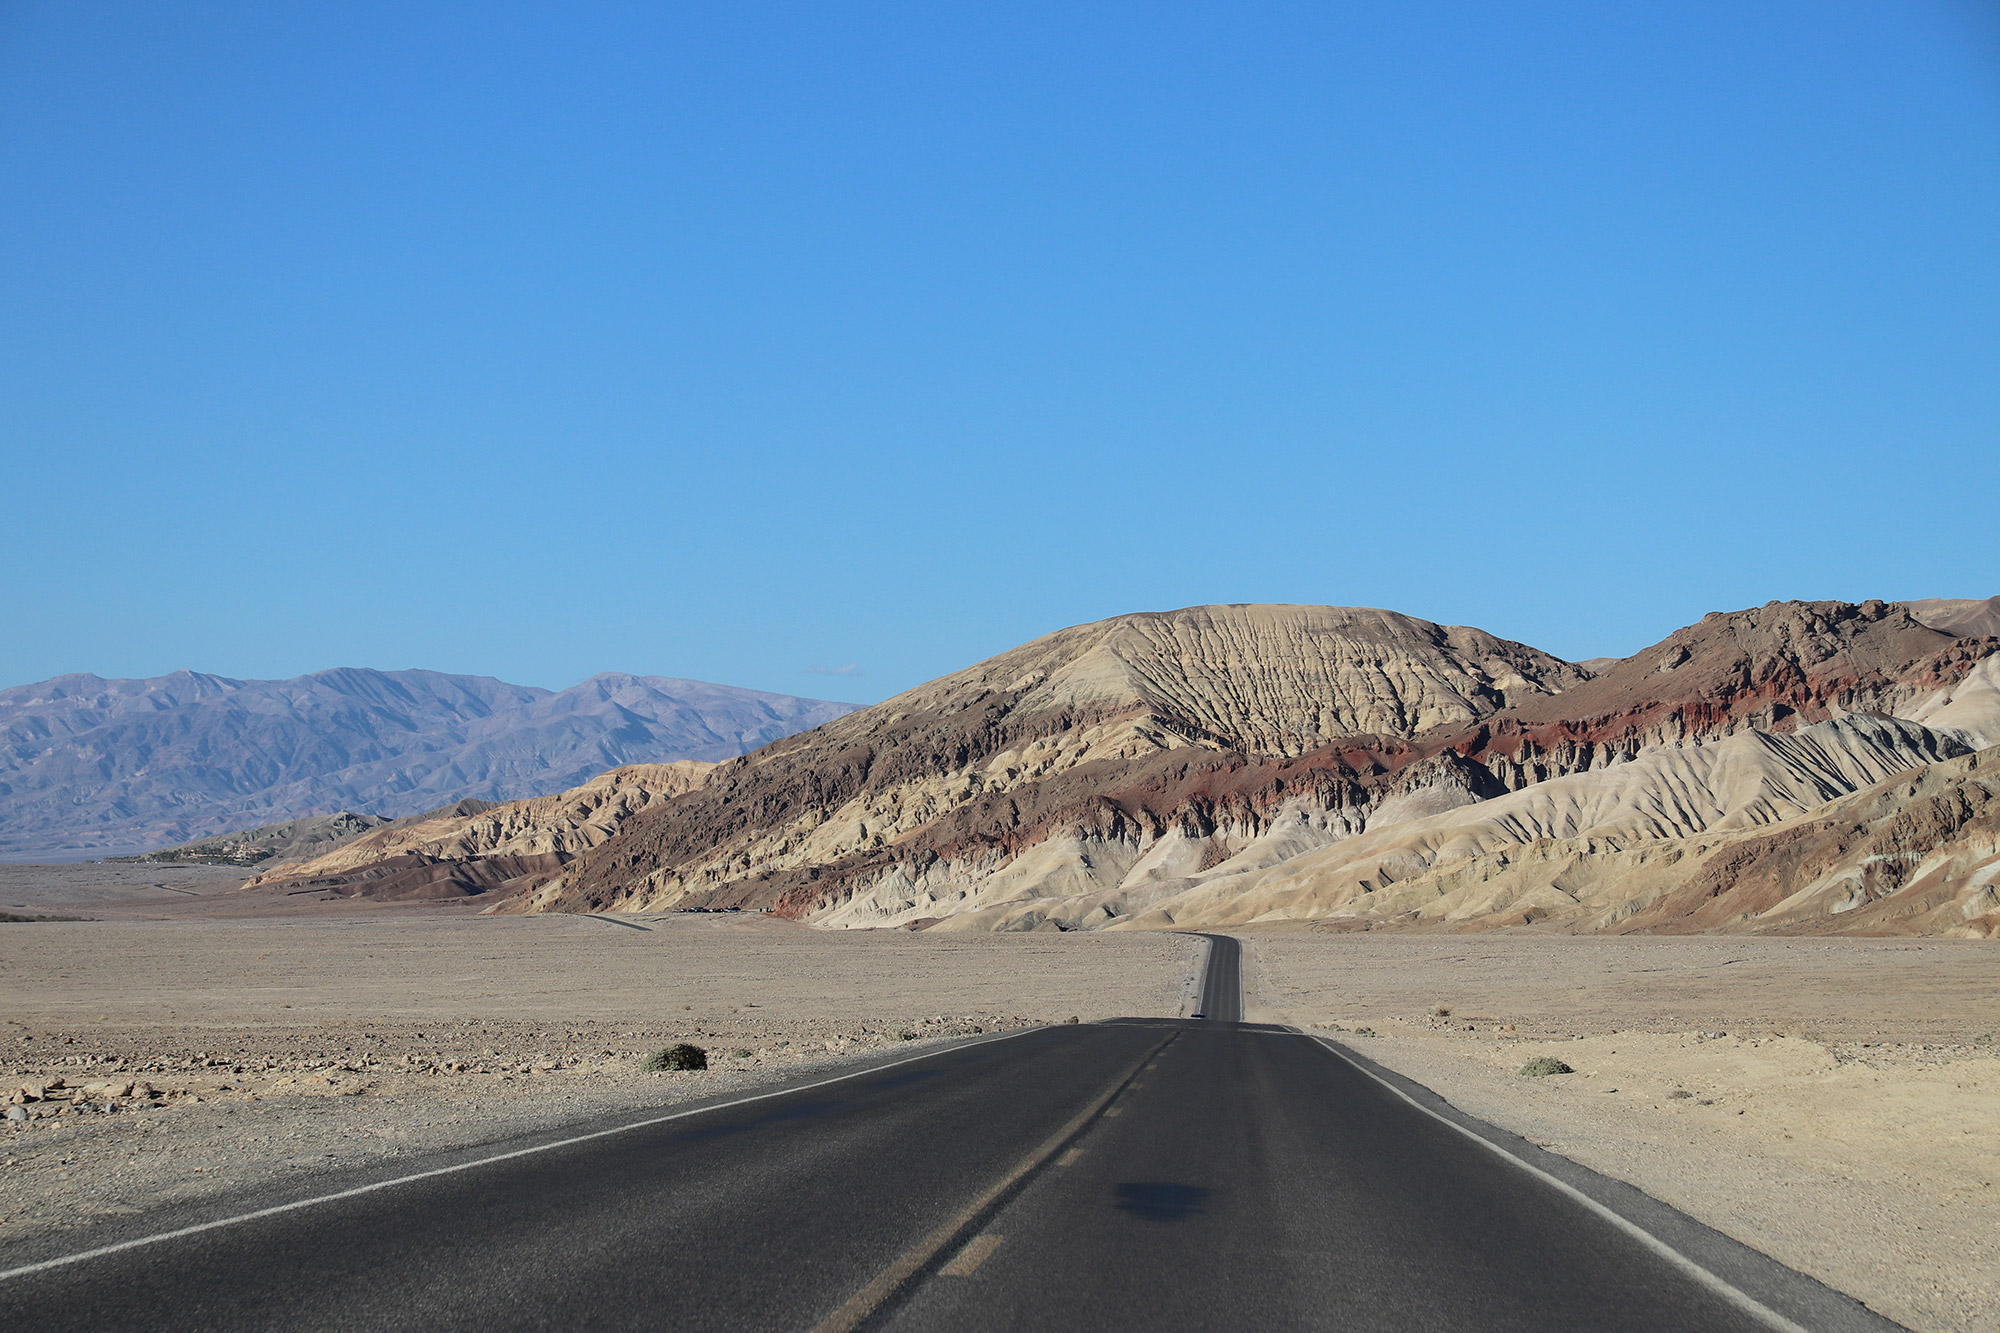 Amerika dag 18 - Death Valley National Park - Badwater Road